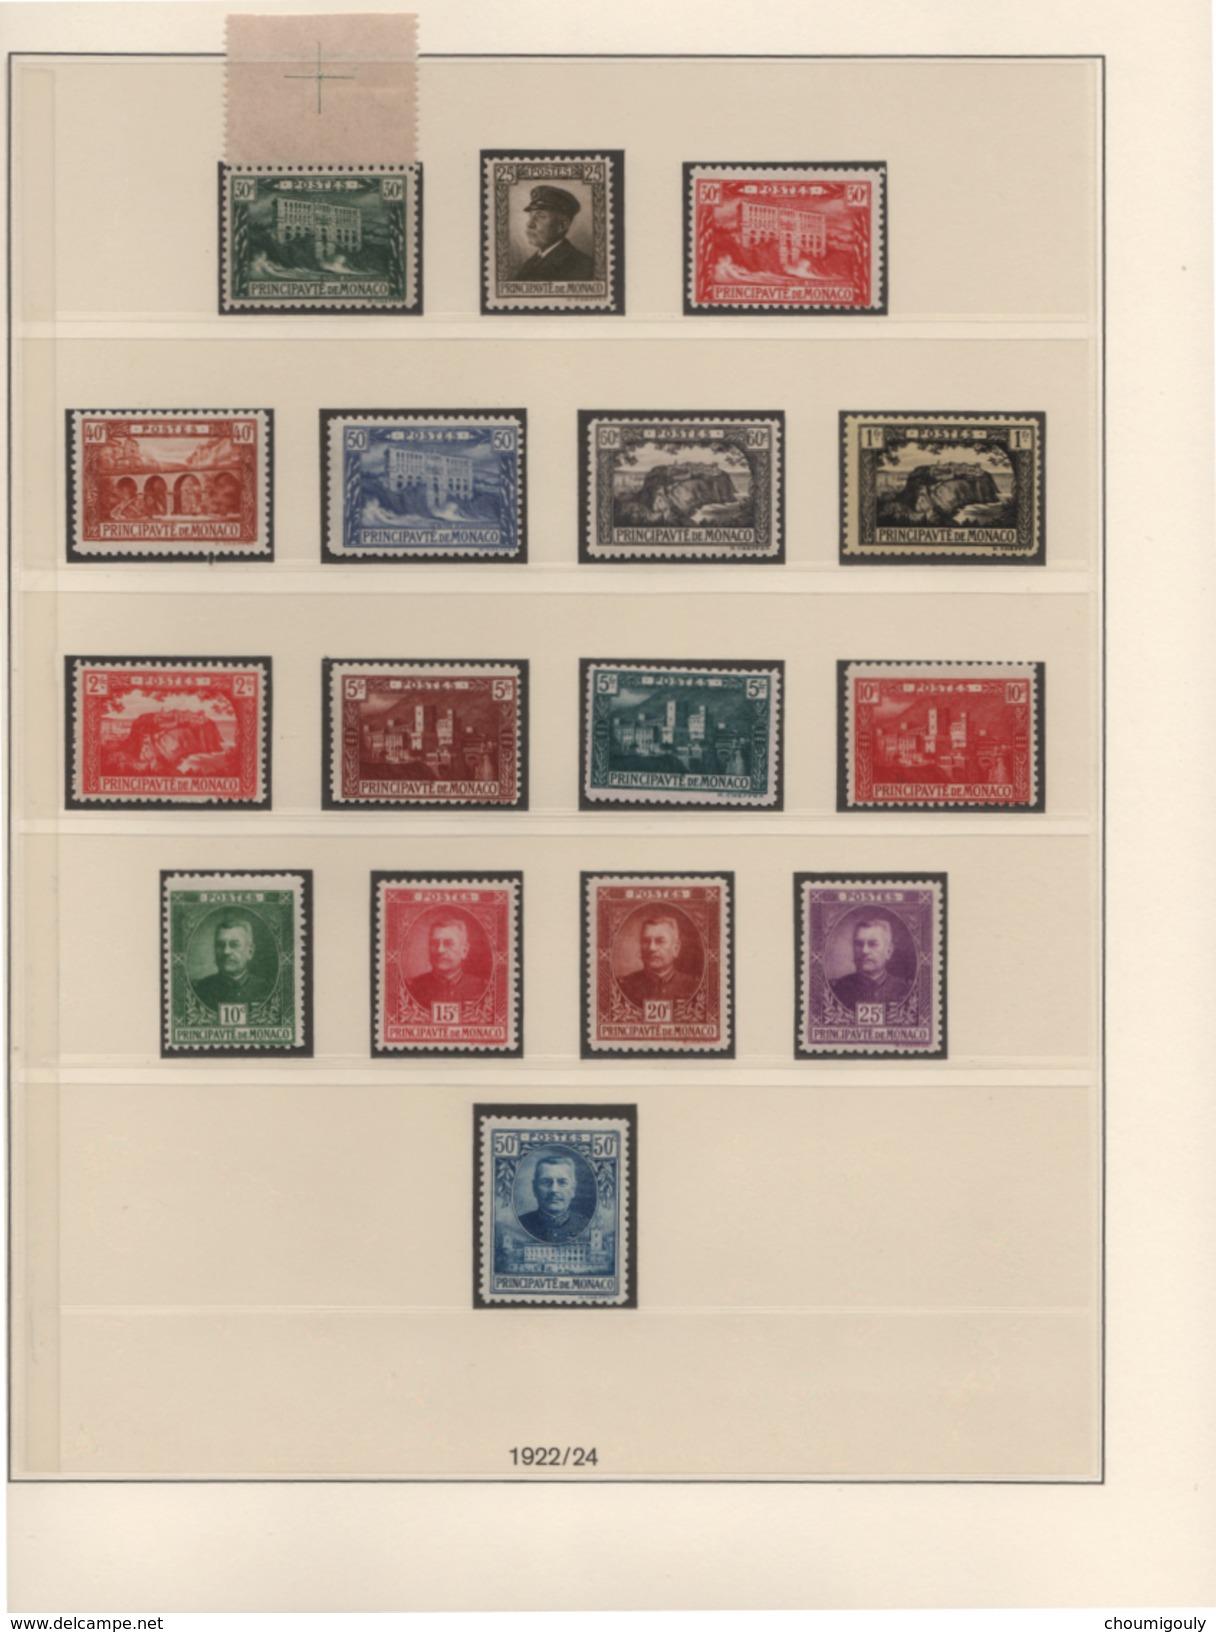 MONACO EXCEPTIONNELLE COLLECTION NEUFS Xx 1885 A 1944 COMPLETE SAUF UN TIMBRE !! - Monaco